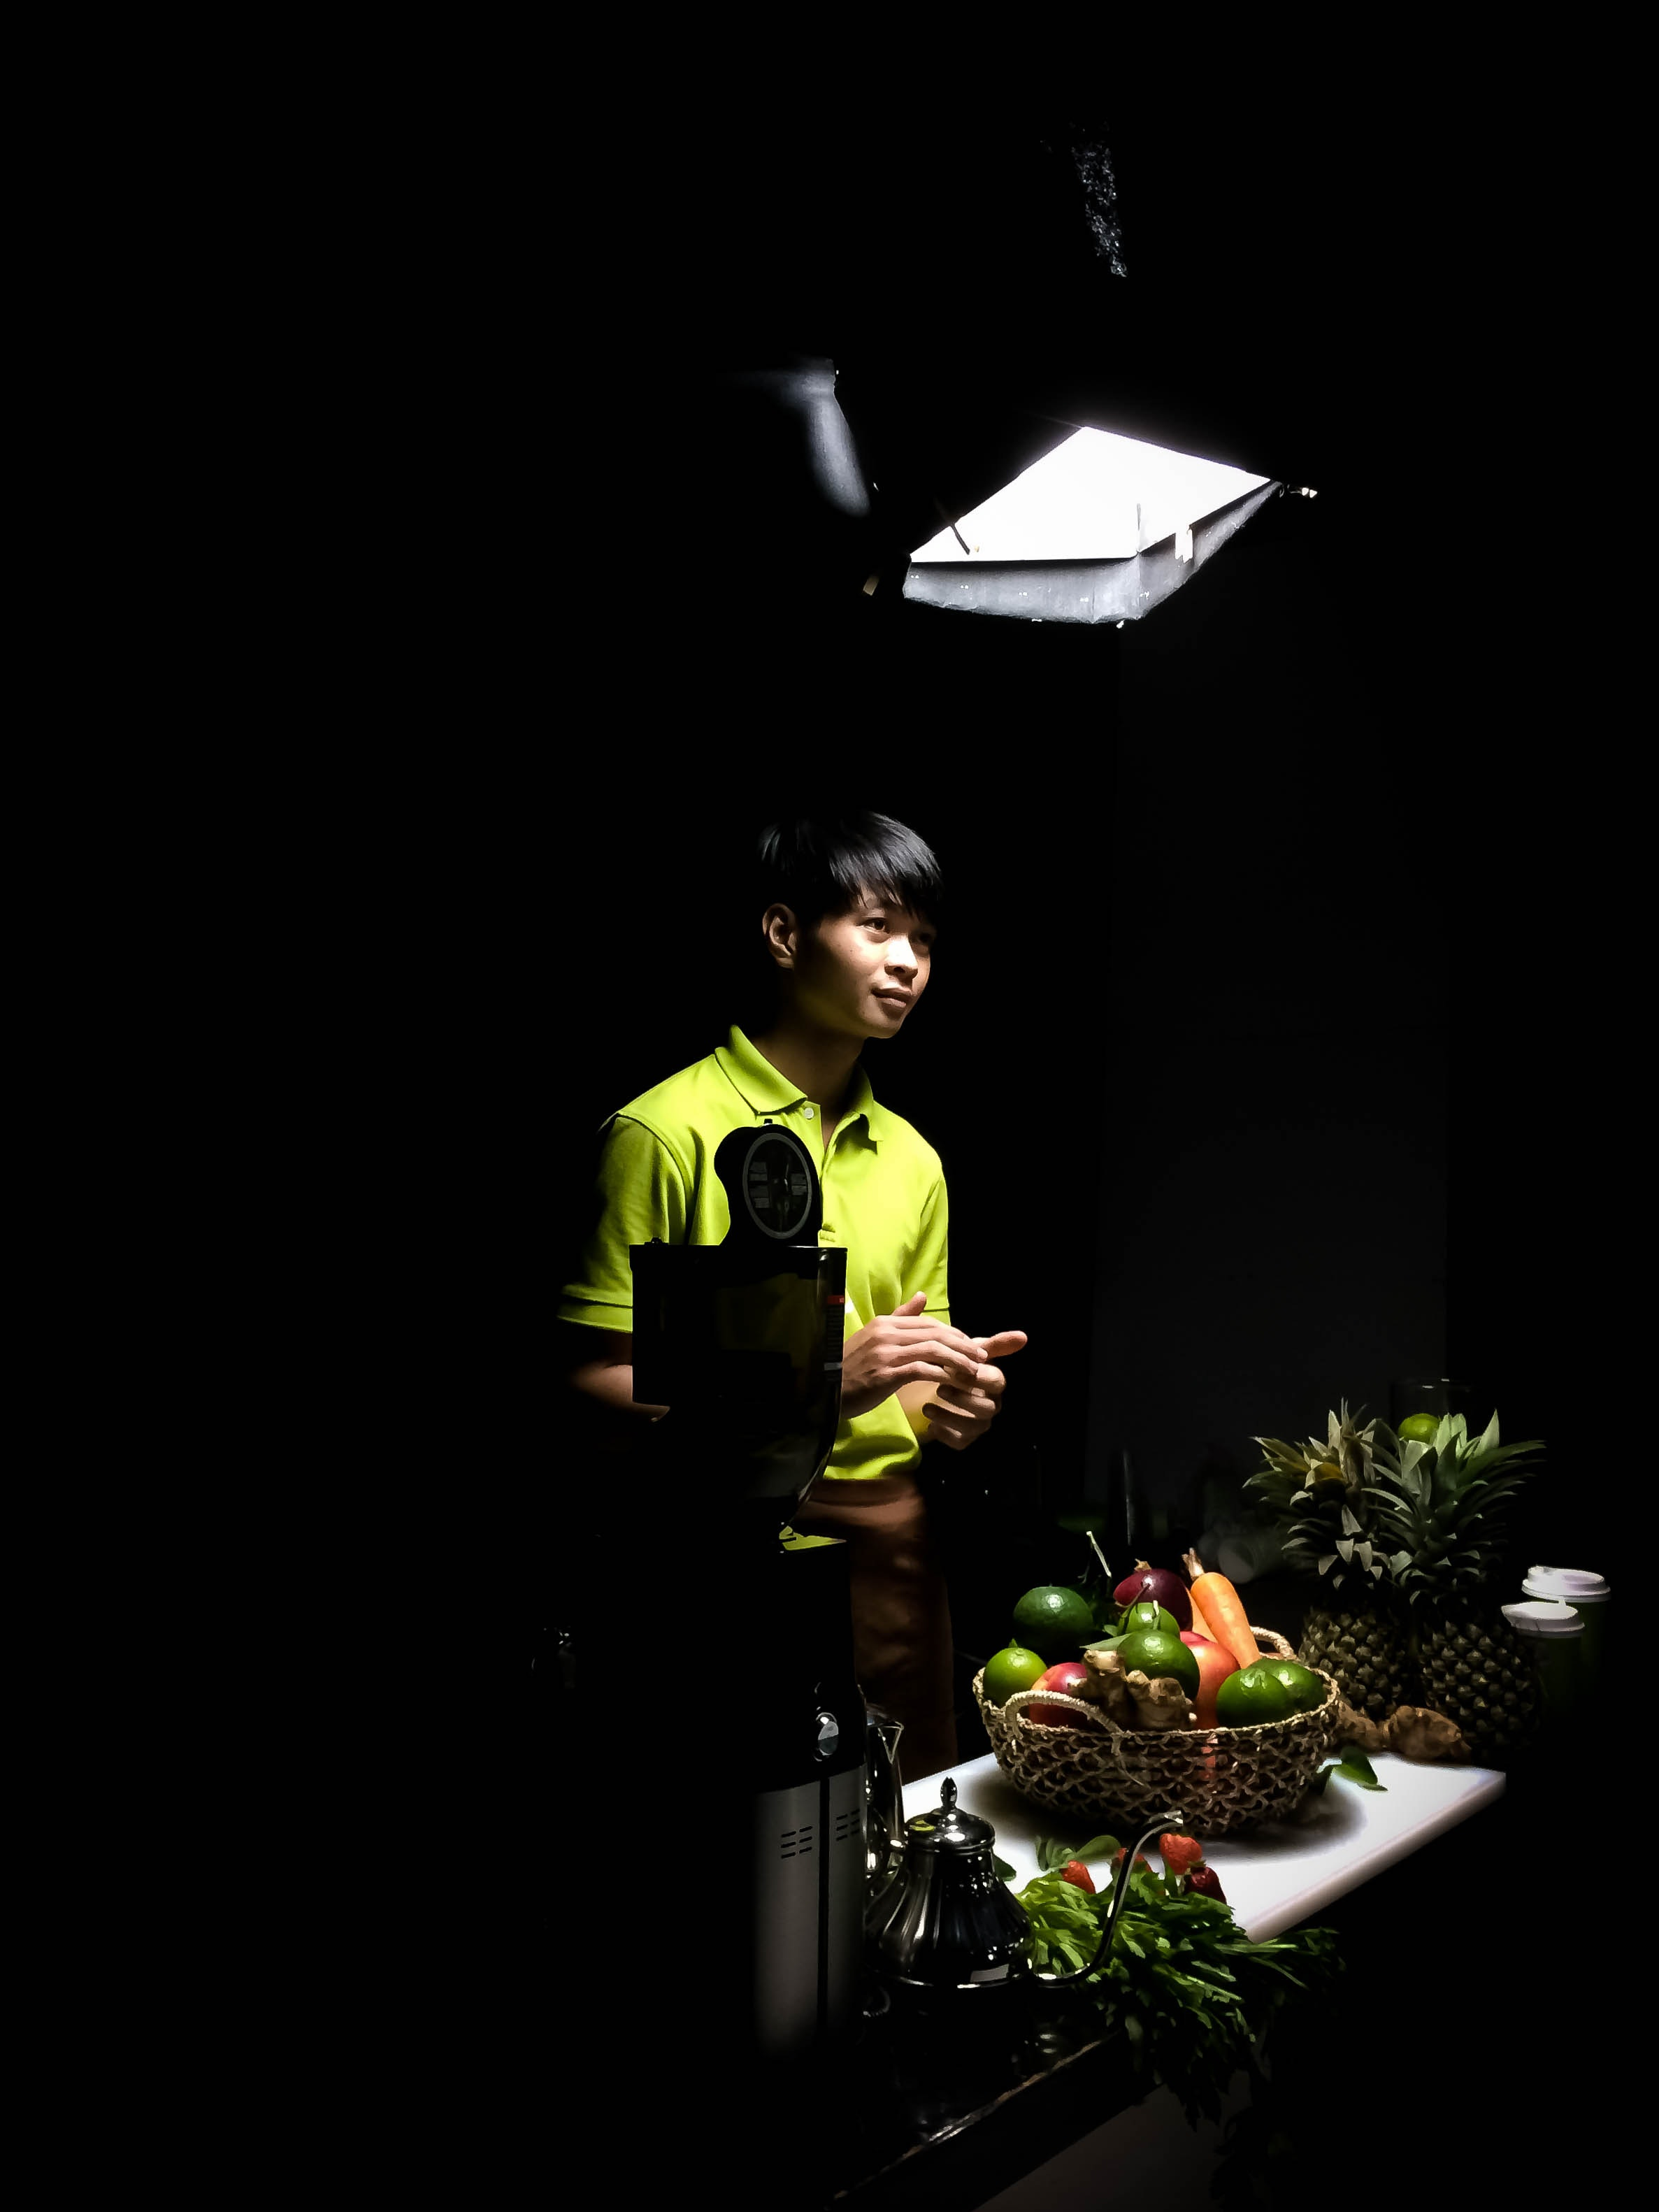 Man in green polo shirt standing photo